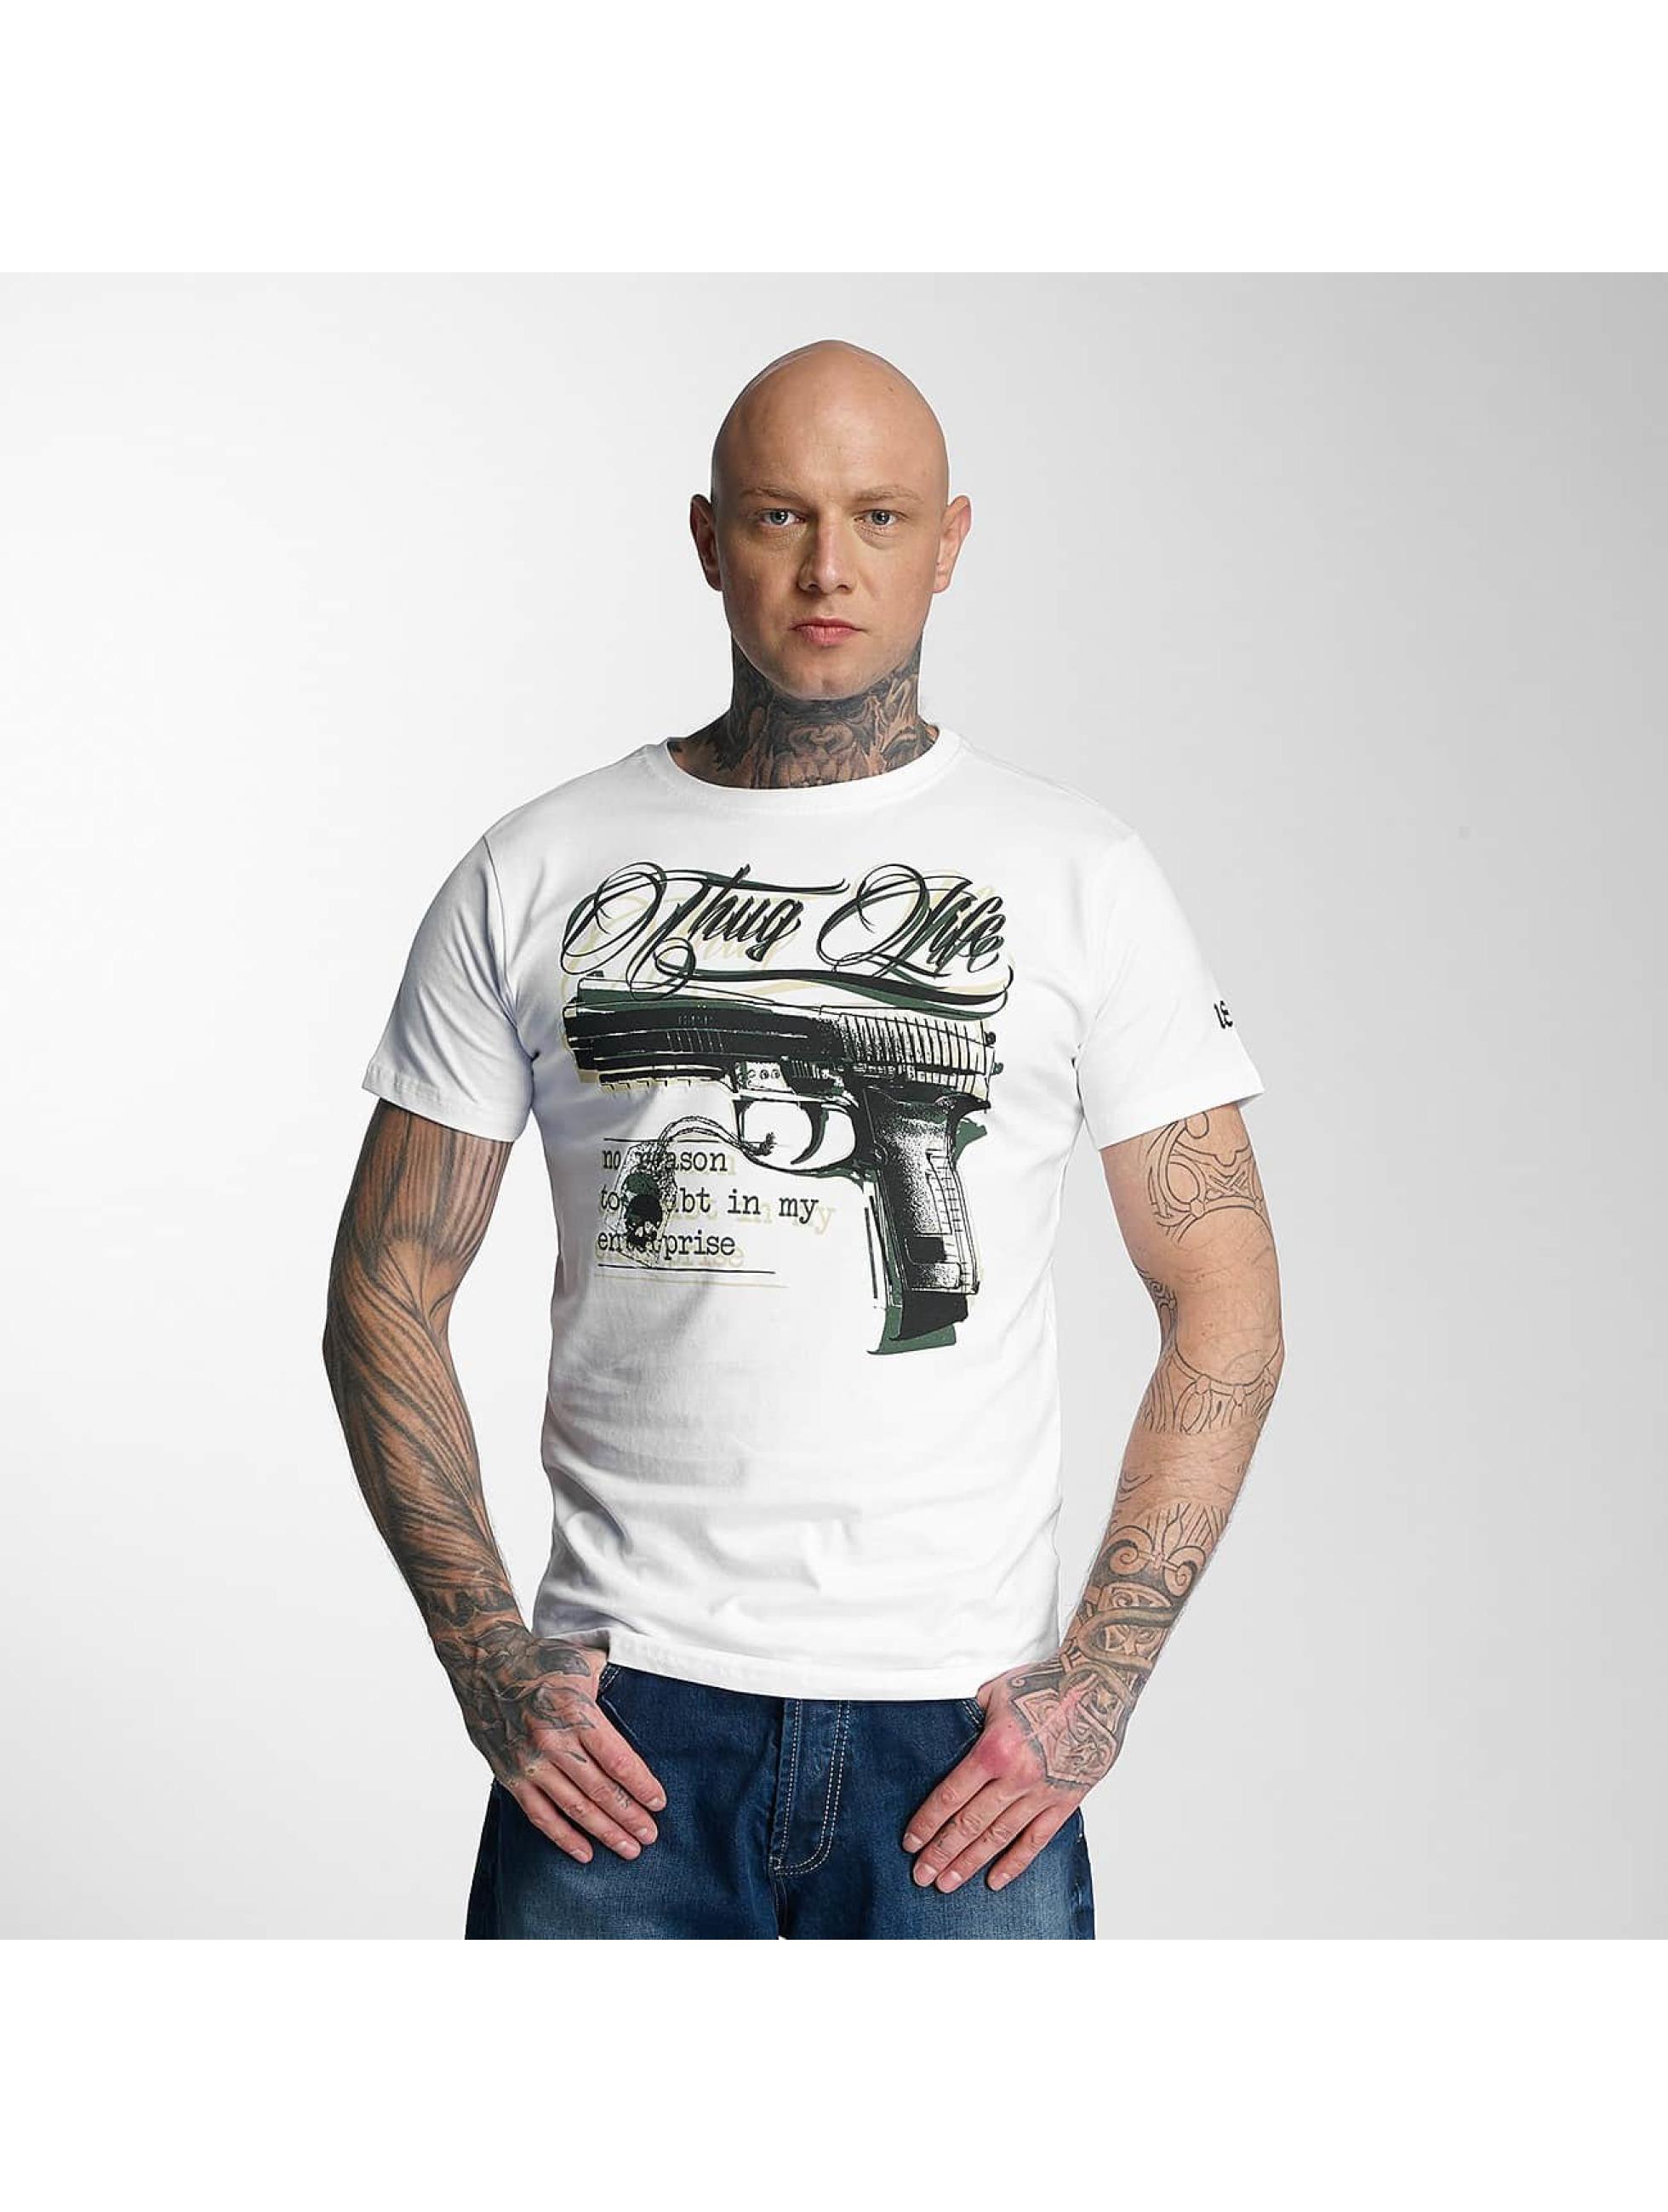 Thug Life / T-Shirt no reason in white XL